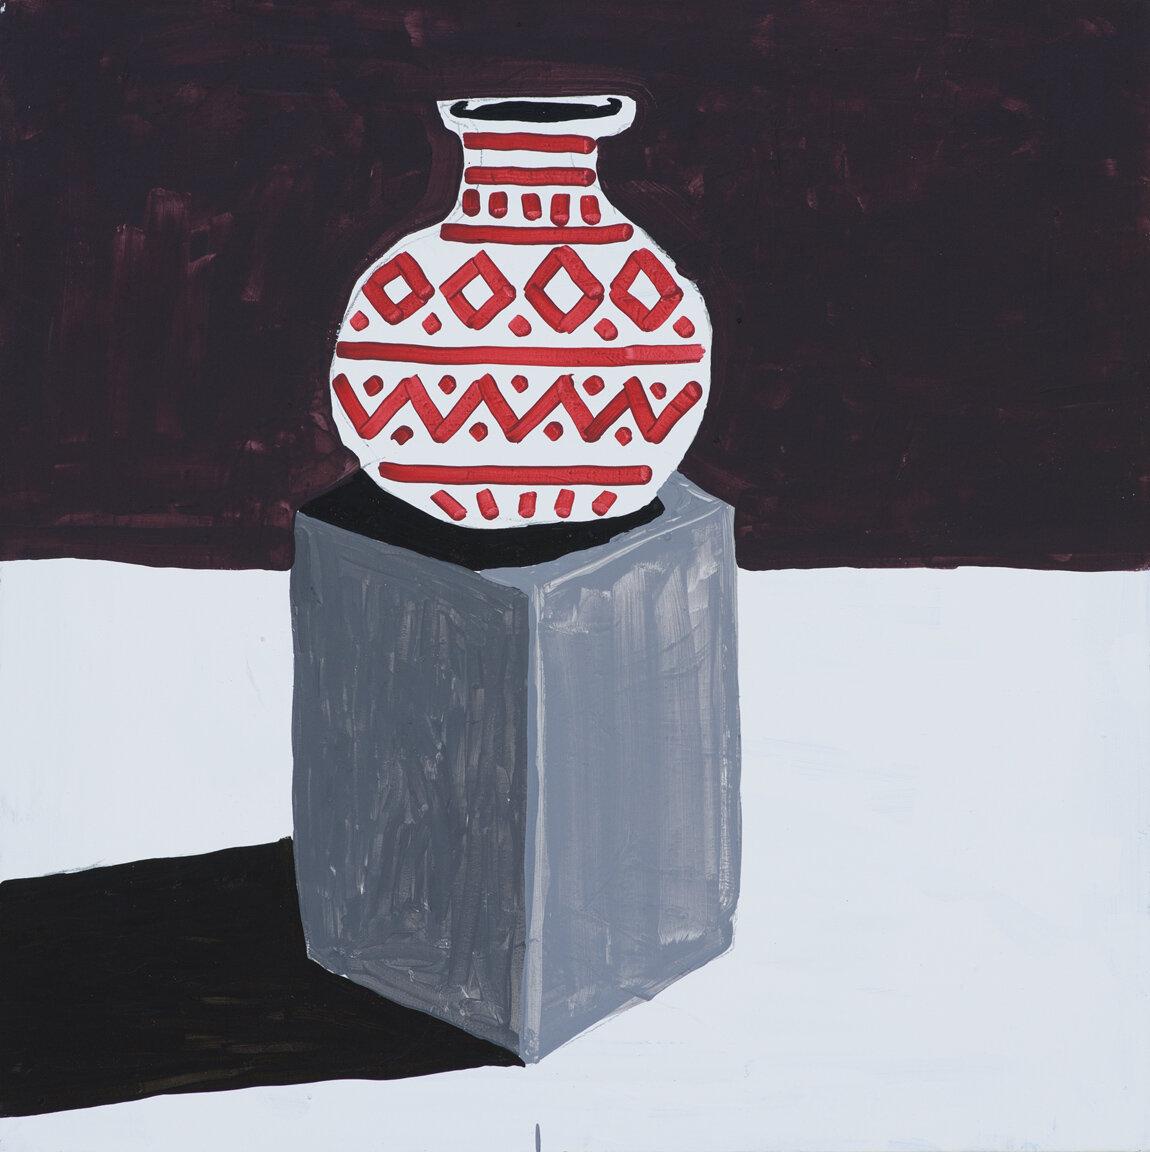 Vase auf Sockel, 2017, acrylic on canvas, 70 x 70 cm